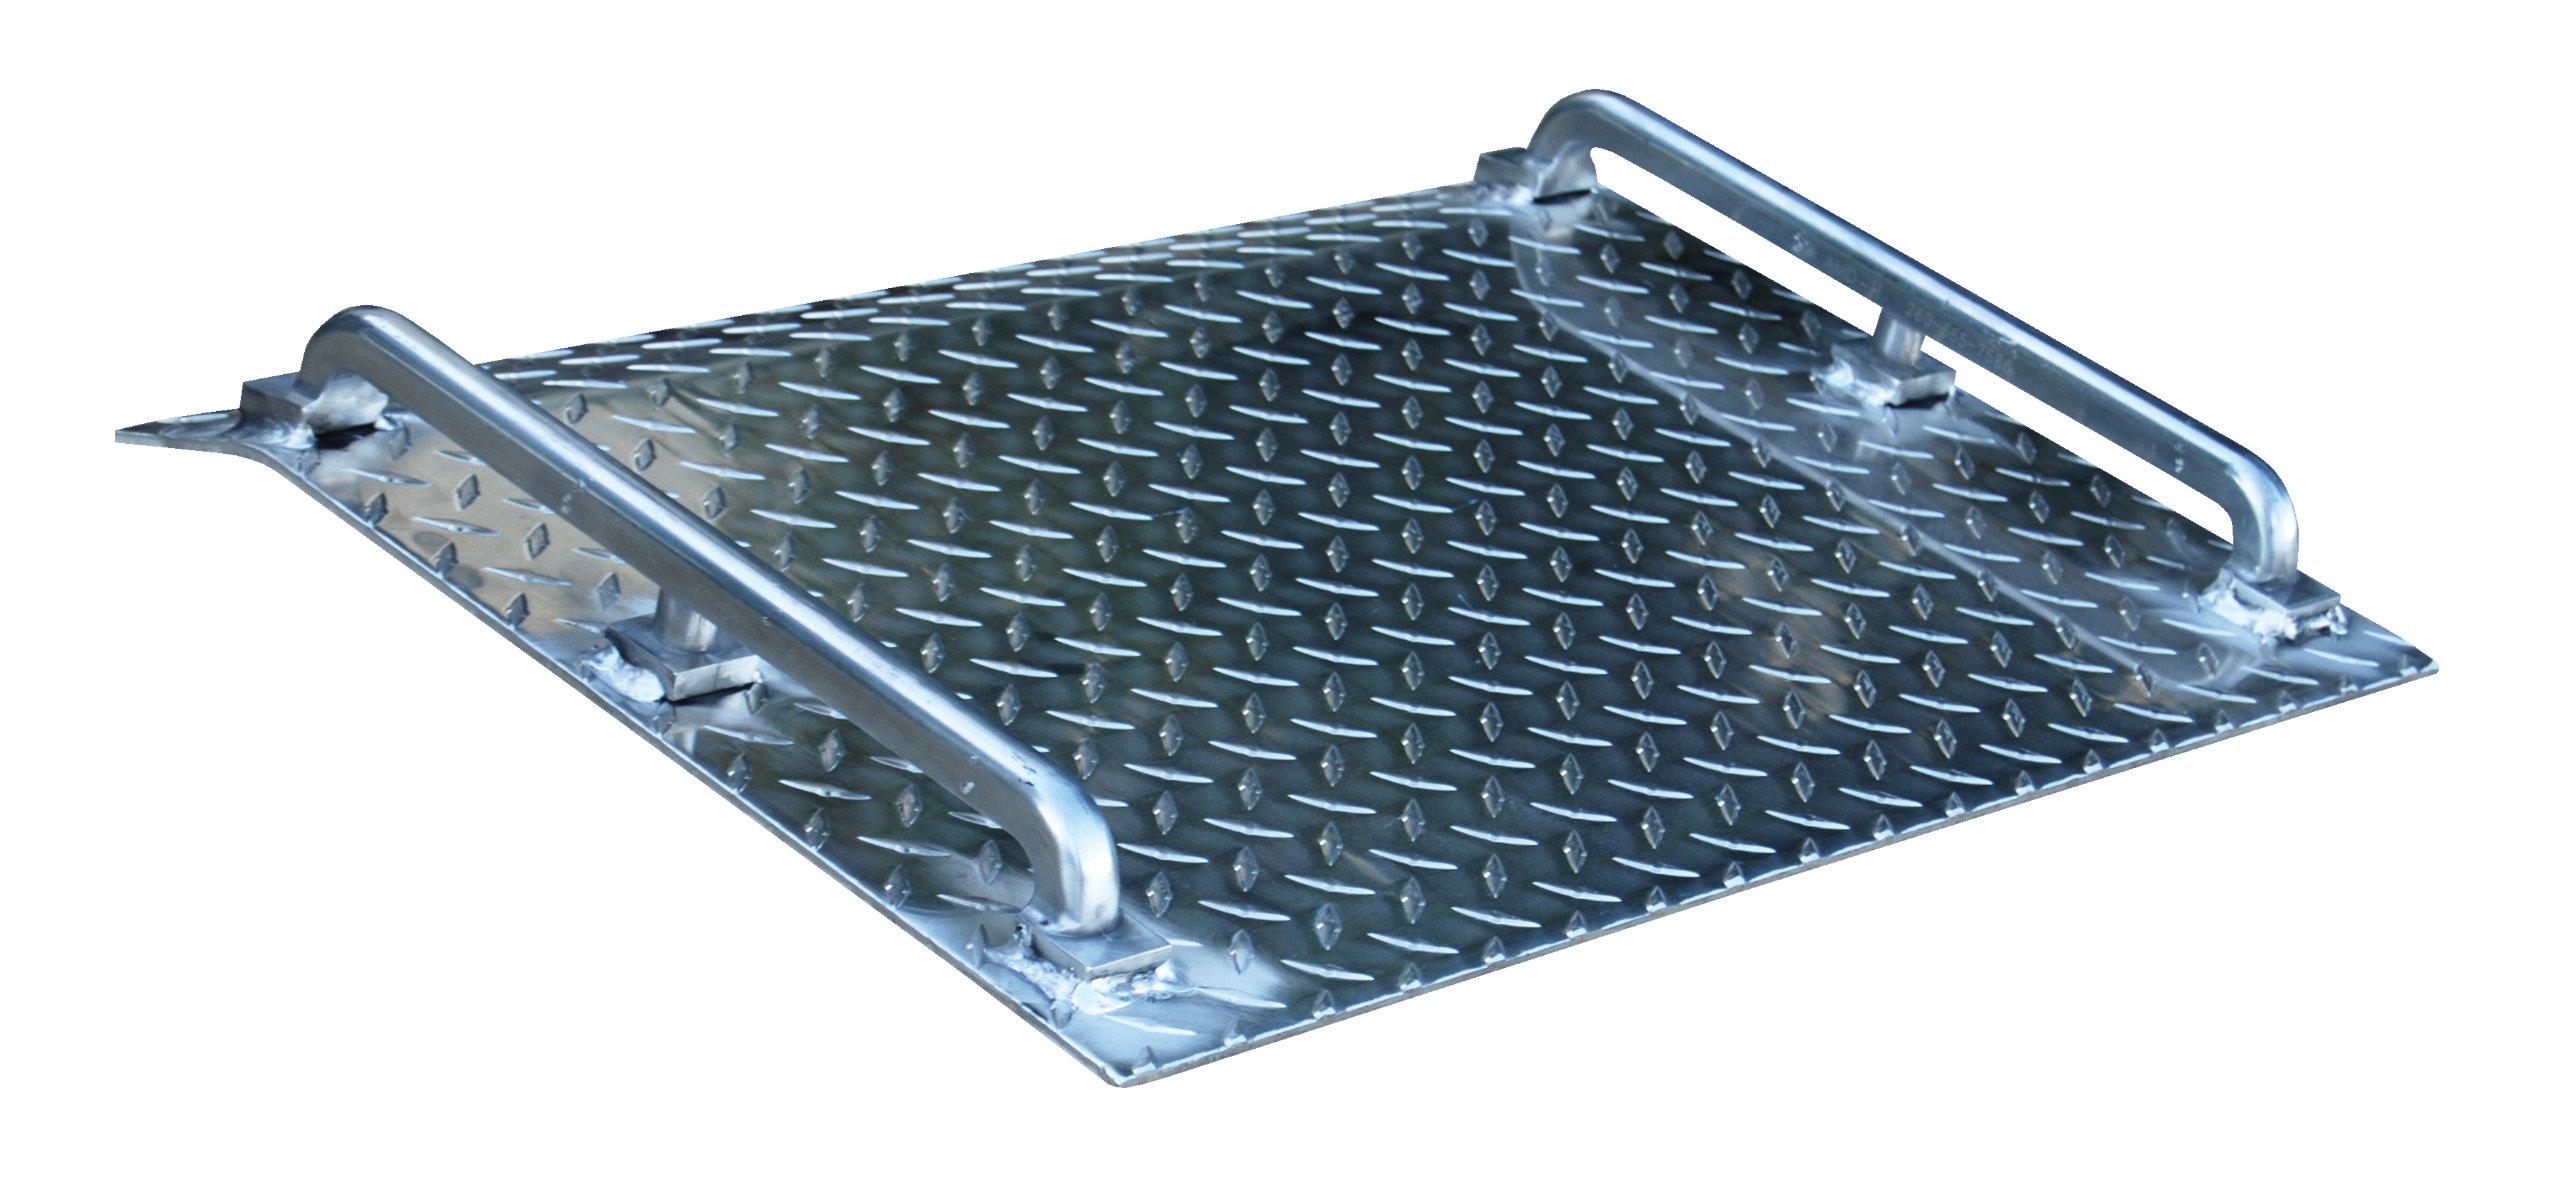 Vestil AMD-2418 Mini Dock Plate, Aluminum, 500-lb. Capacity, 18'' Length x 24'' Width x 1/8 Thick